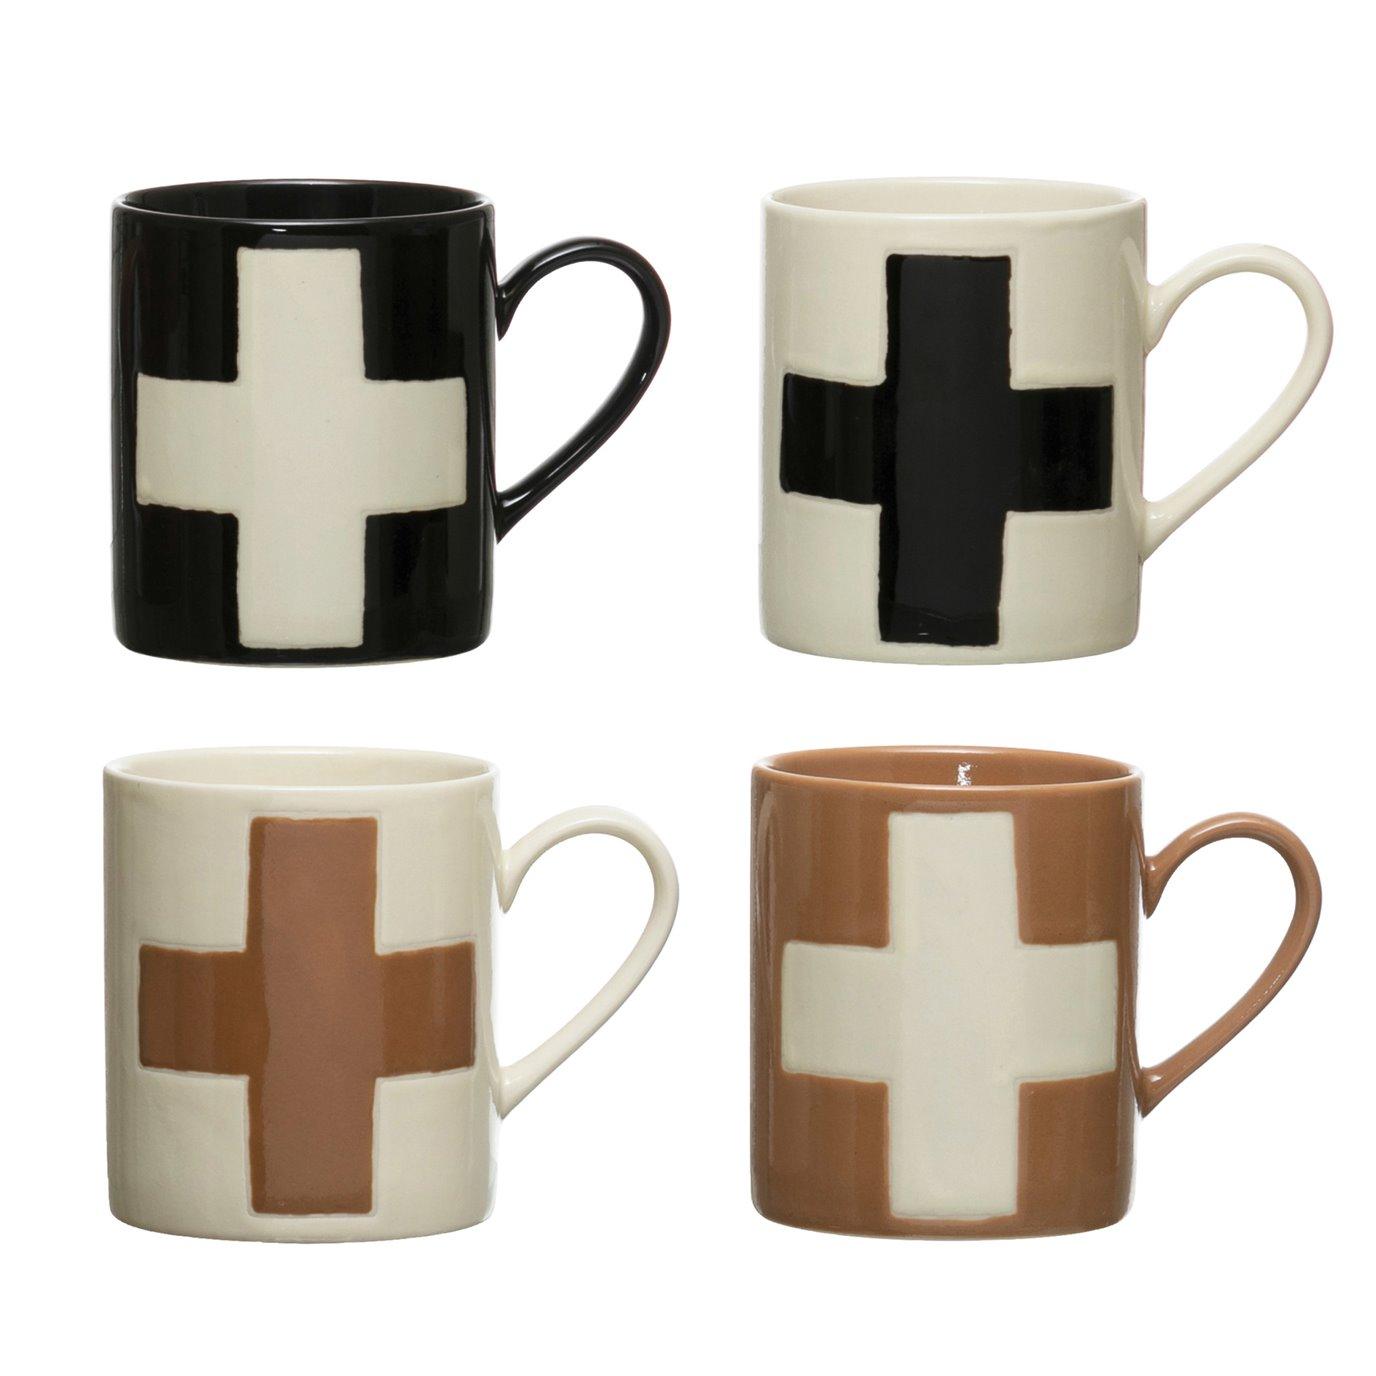 8 oz. Handmade Stoneware Mug w/ Wax Relief Swiss Cross, 4 Colors (Each One Will Vary)